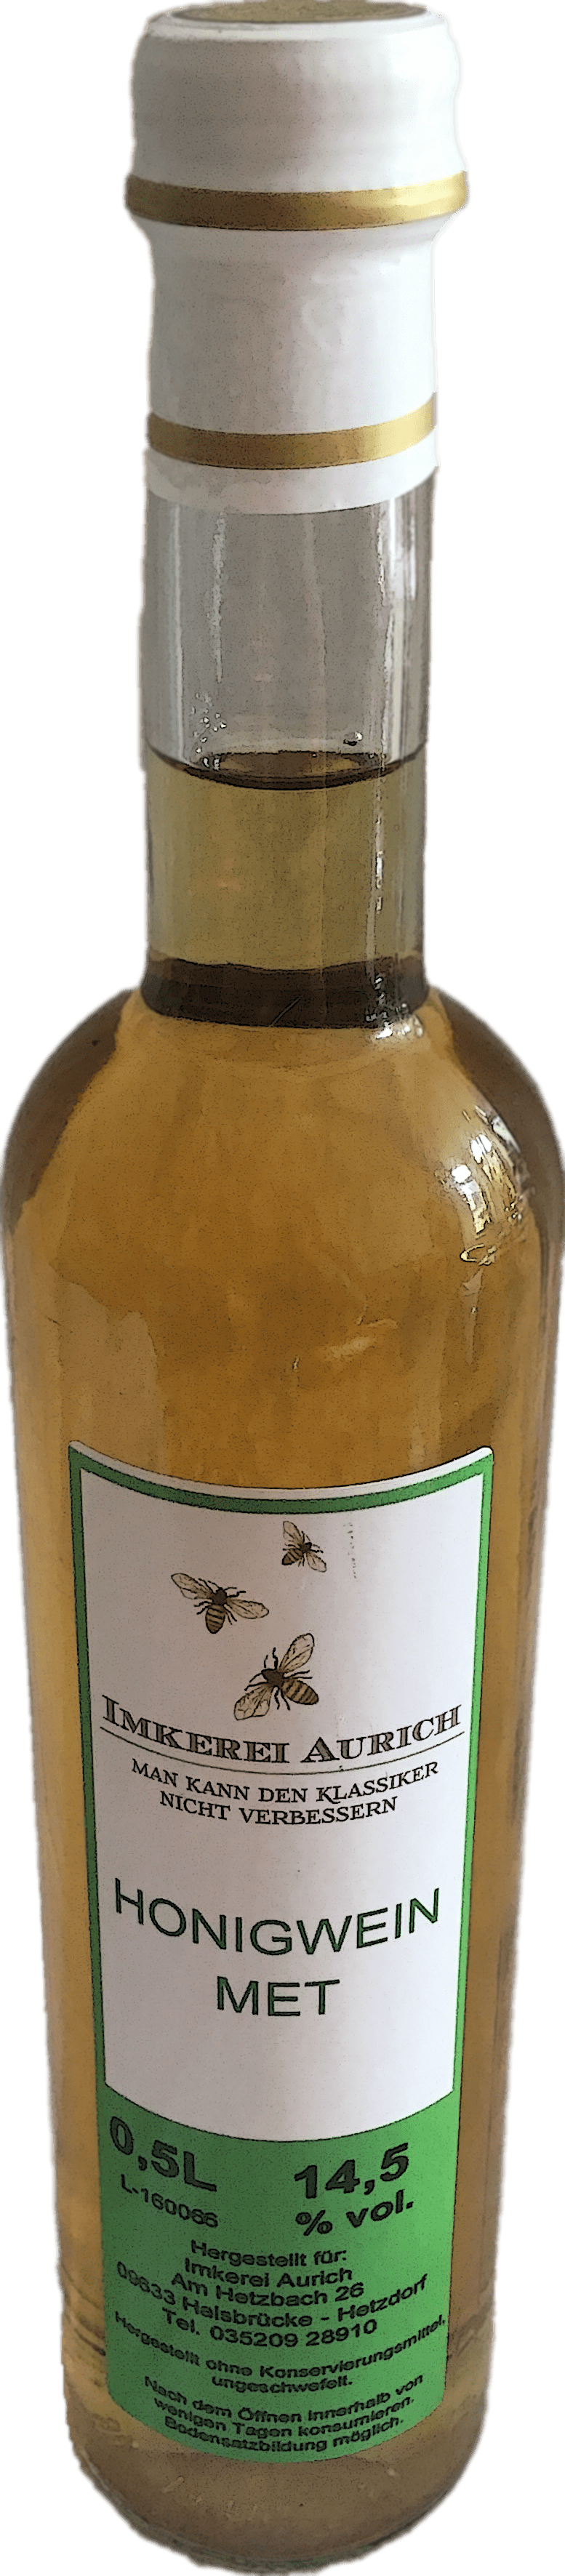 Honigwein-min